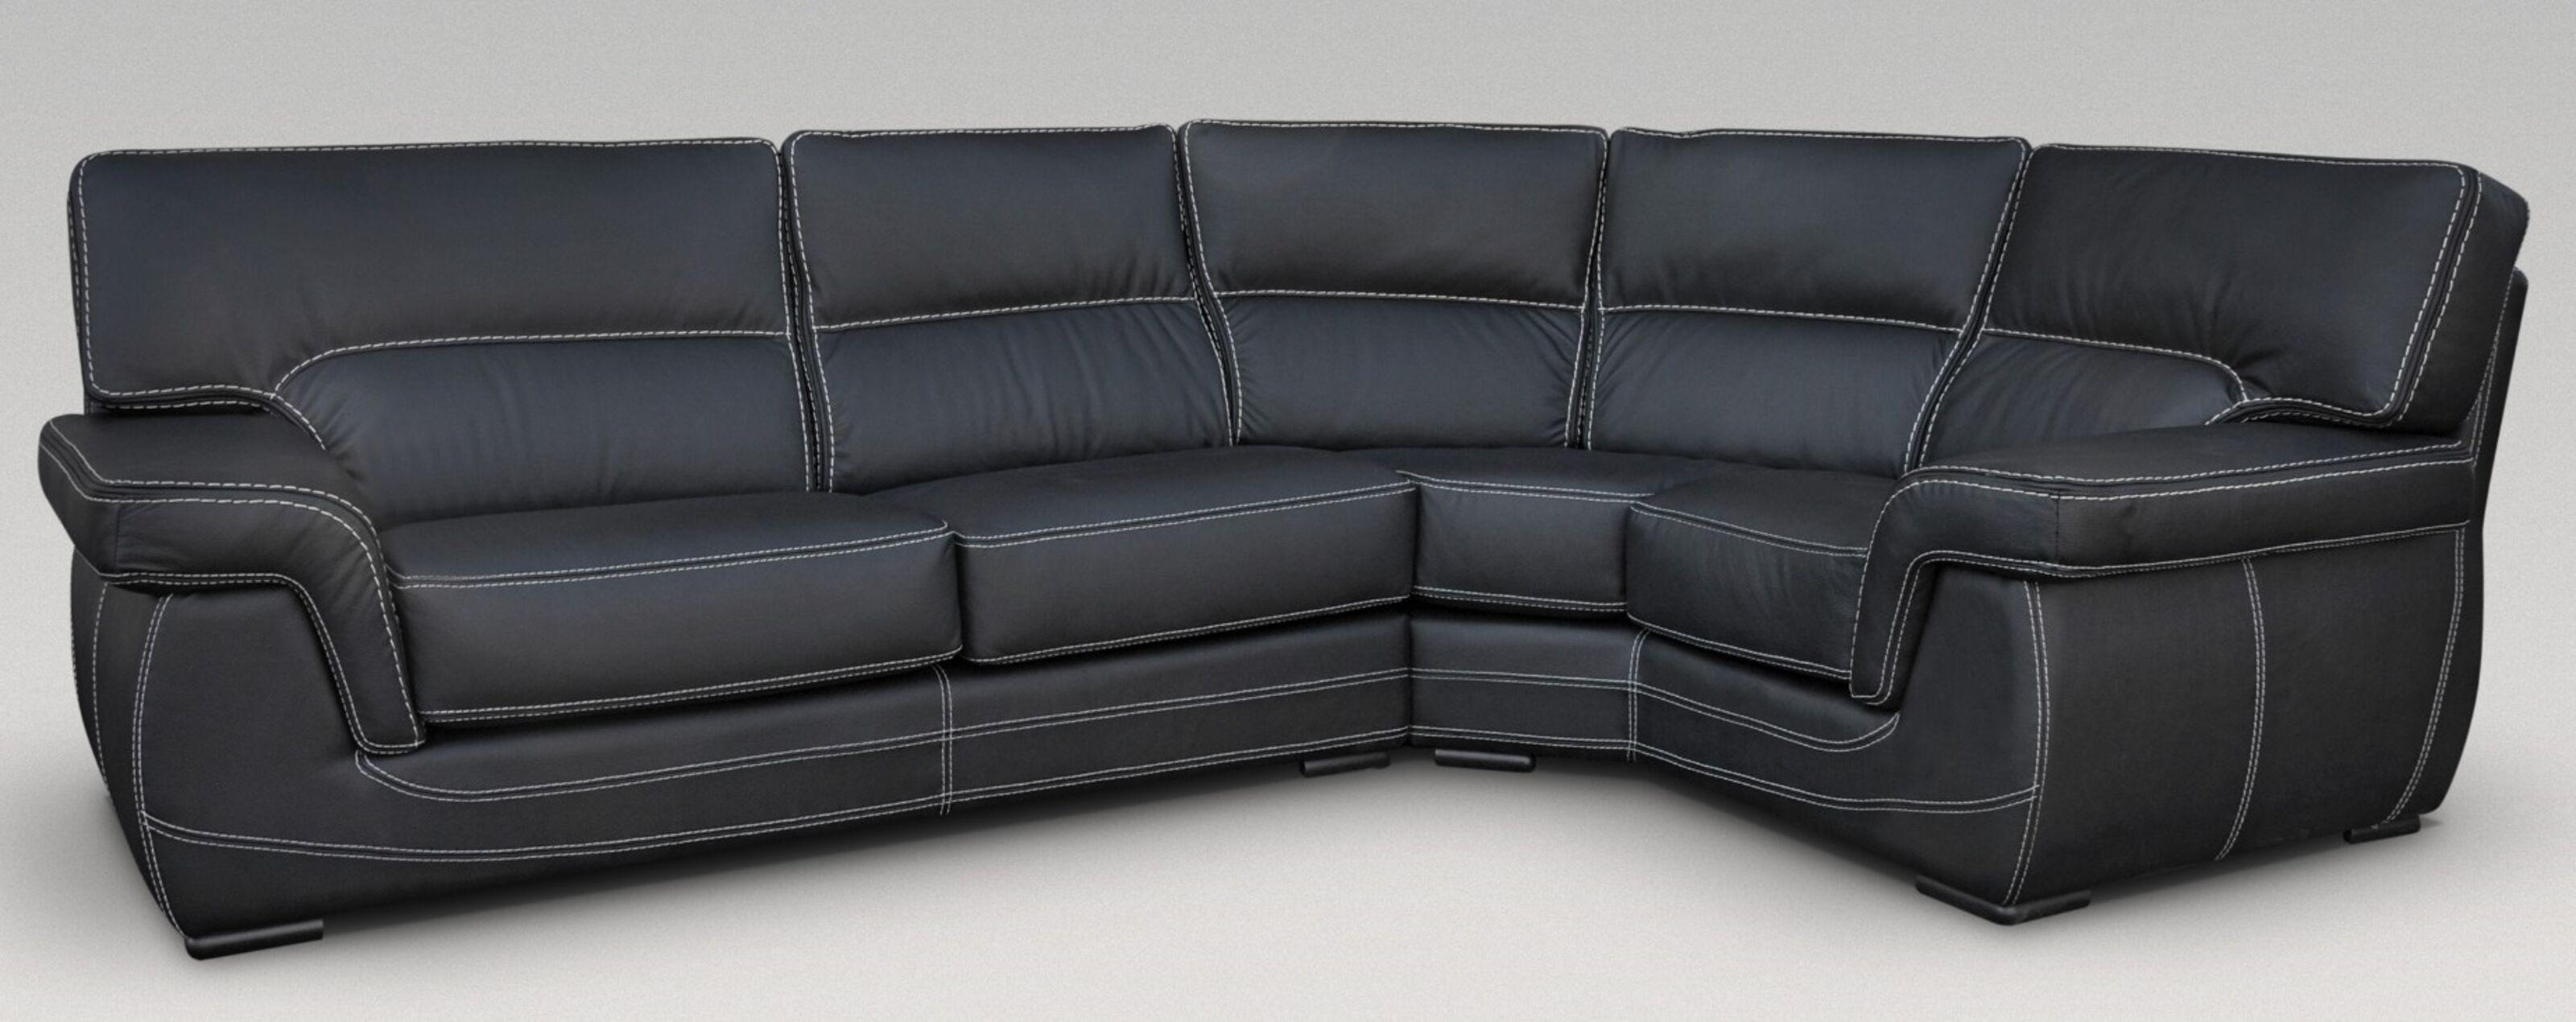 Cool Alaska 3 Corner 1 Genuine Italian Black Leather Corner Sofa Group Suite Offer Cjindustries Chair Design For Home Cjindustriesco